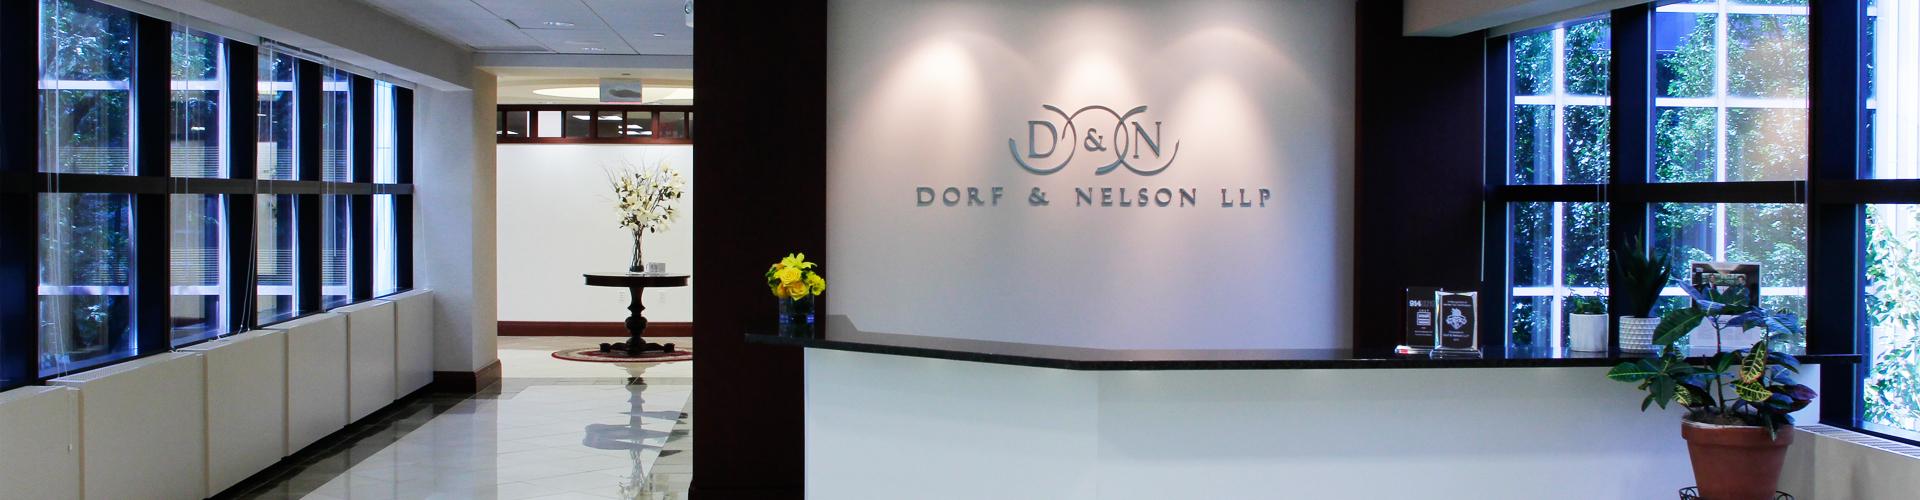 Photo of Dorf & Nelson Reception Area